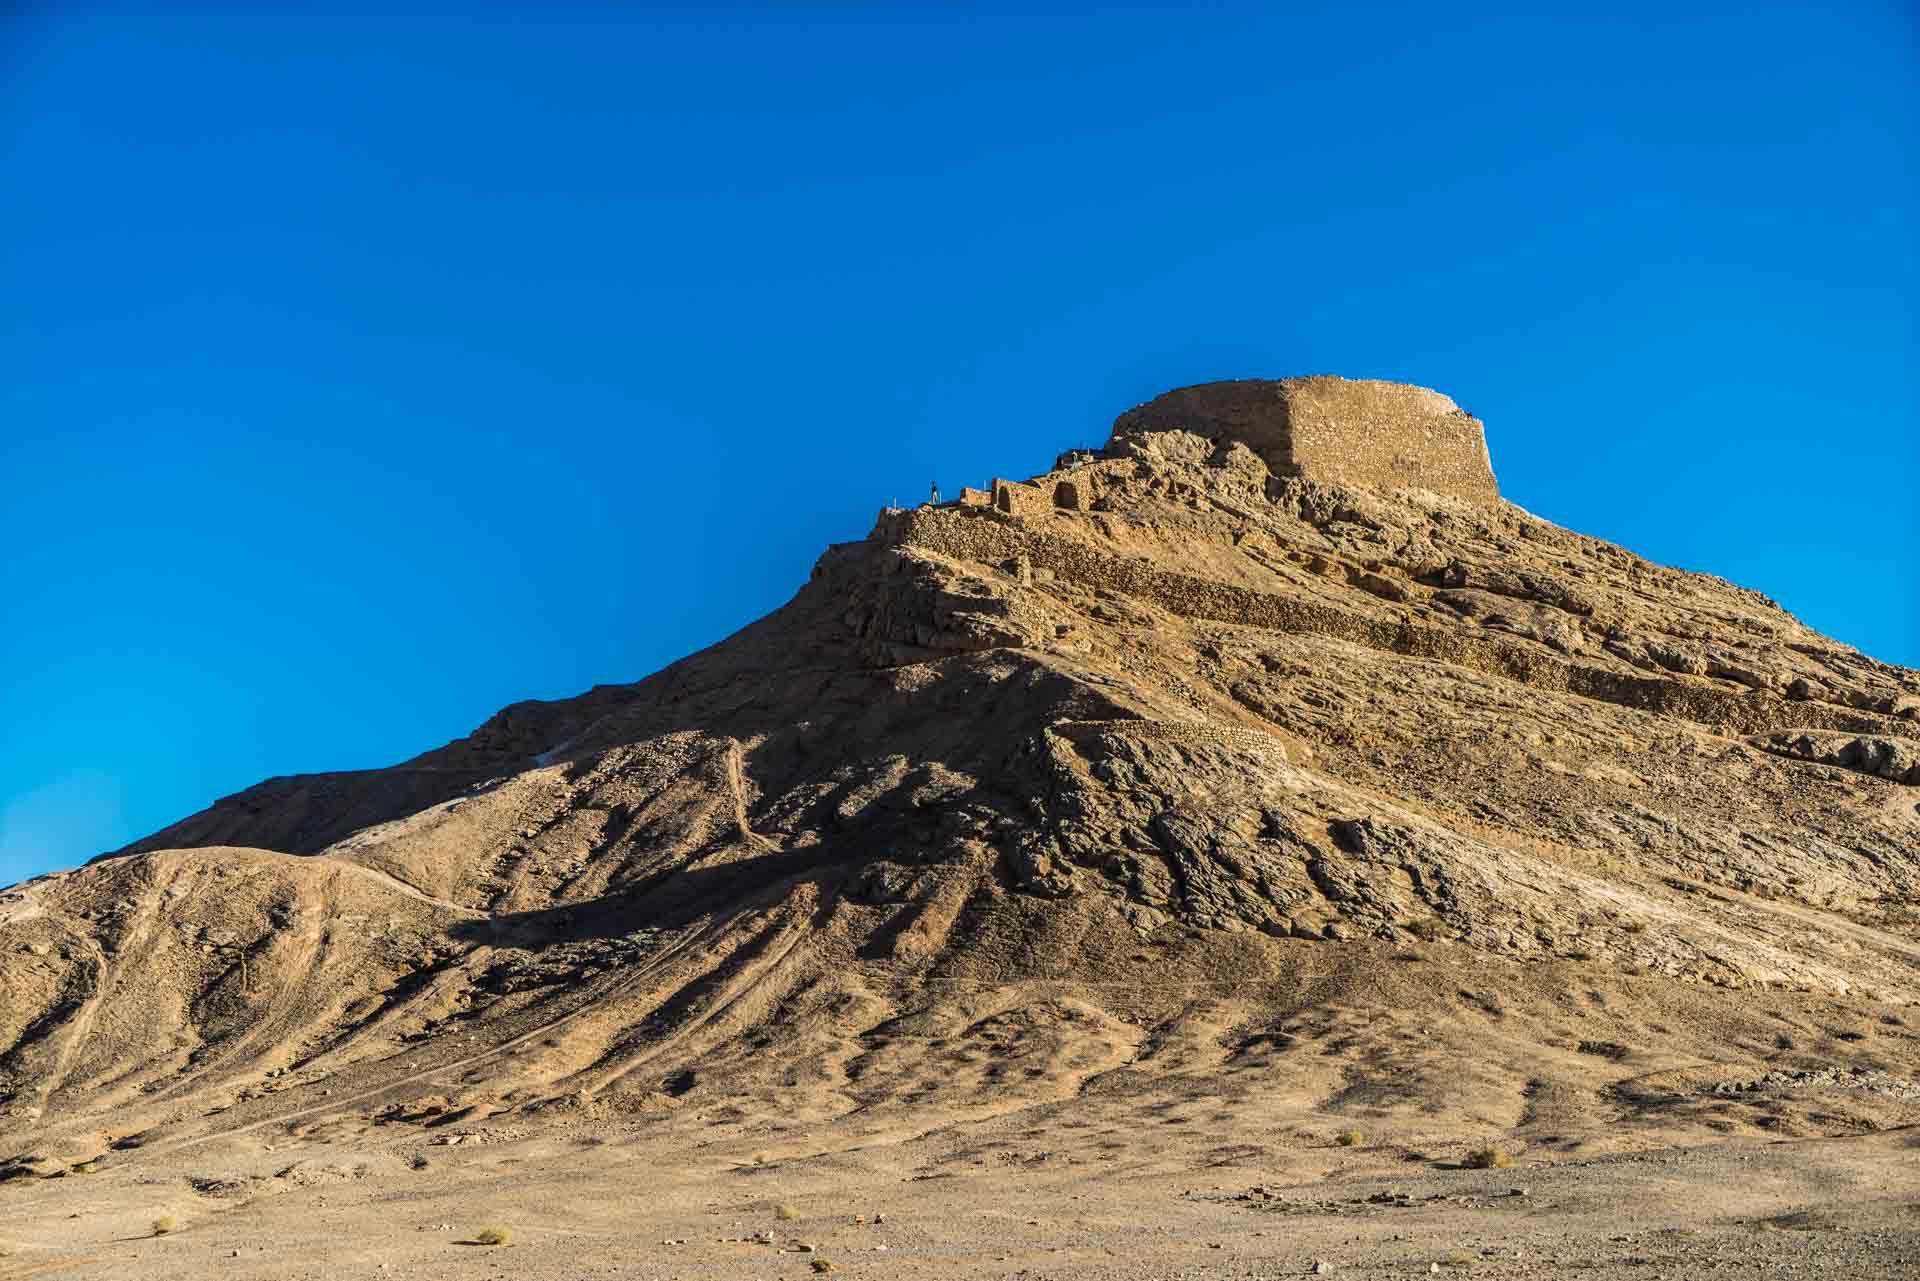 Yazd Zoroastrian Towers of Silence 4